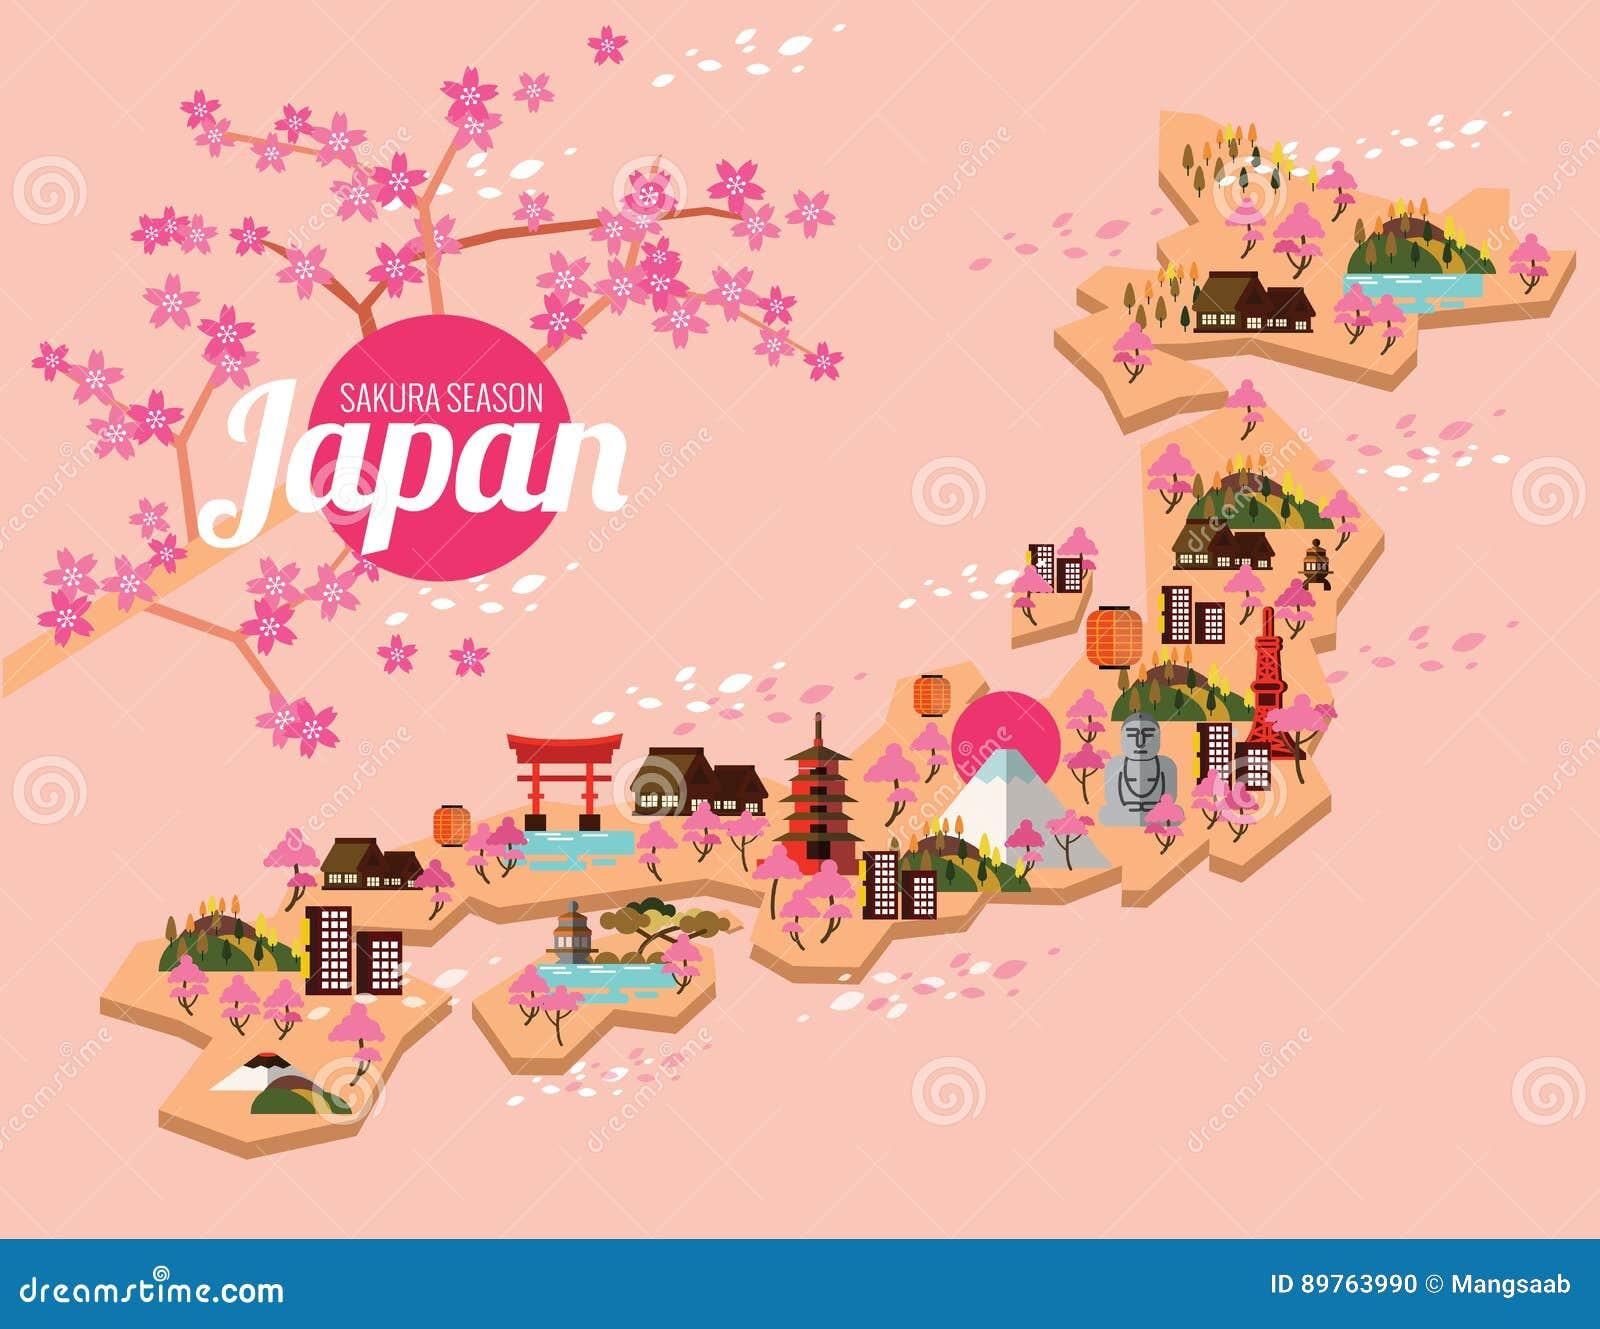 Japan Travel Map Sakura Season In Japanese Stock Vector Image - Japan map cartoon